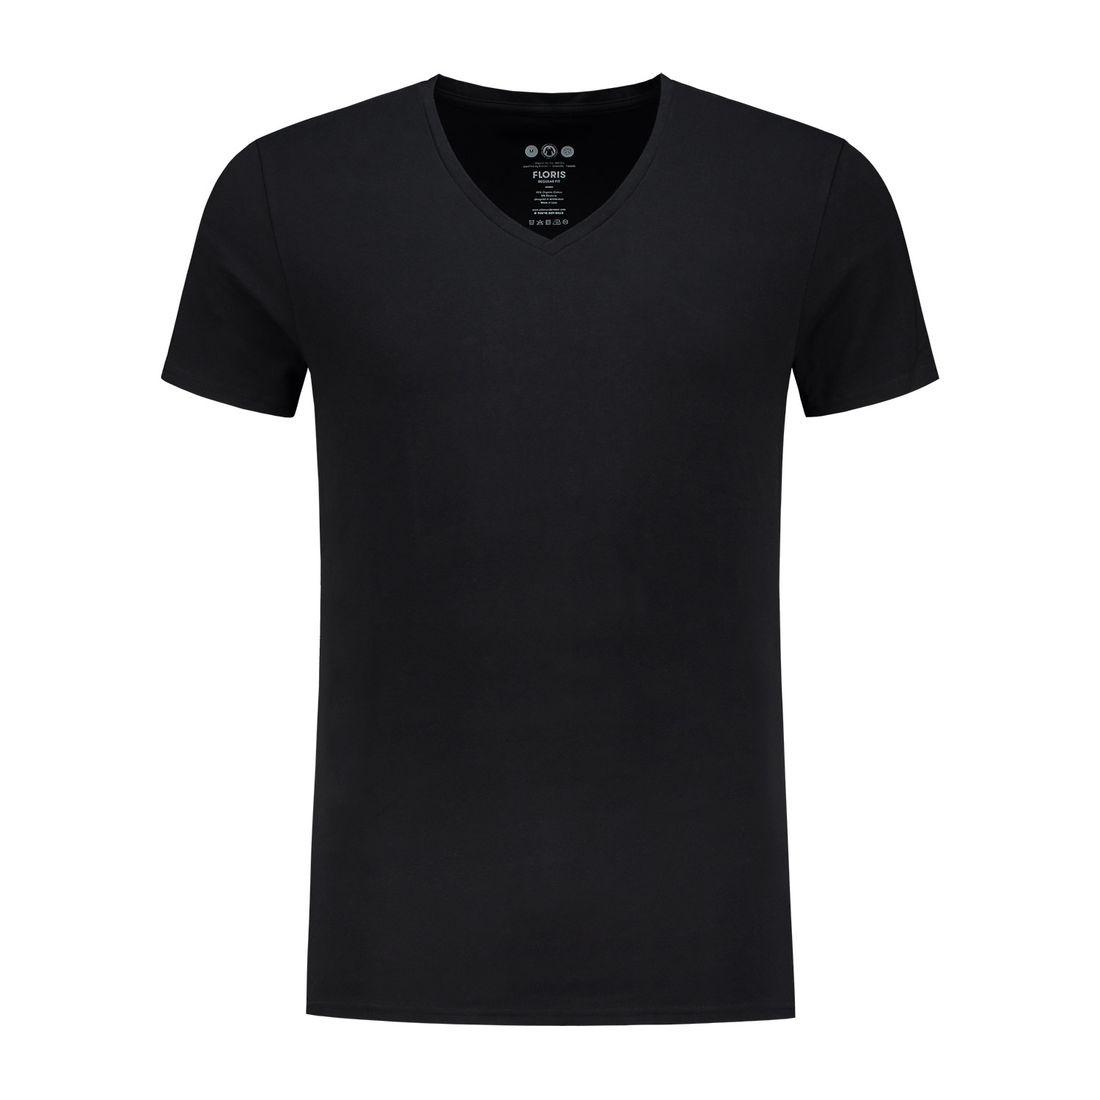 Afbeelding van A dam Underwear floris V hals shirt zwart heren